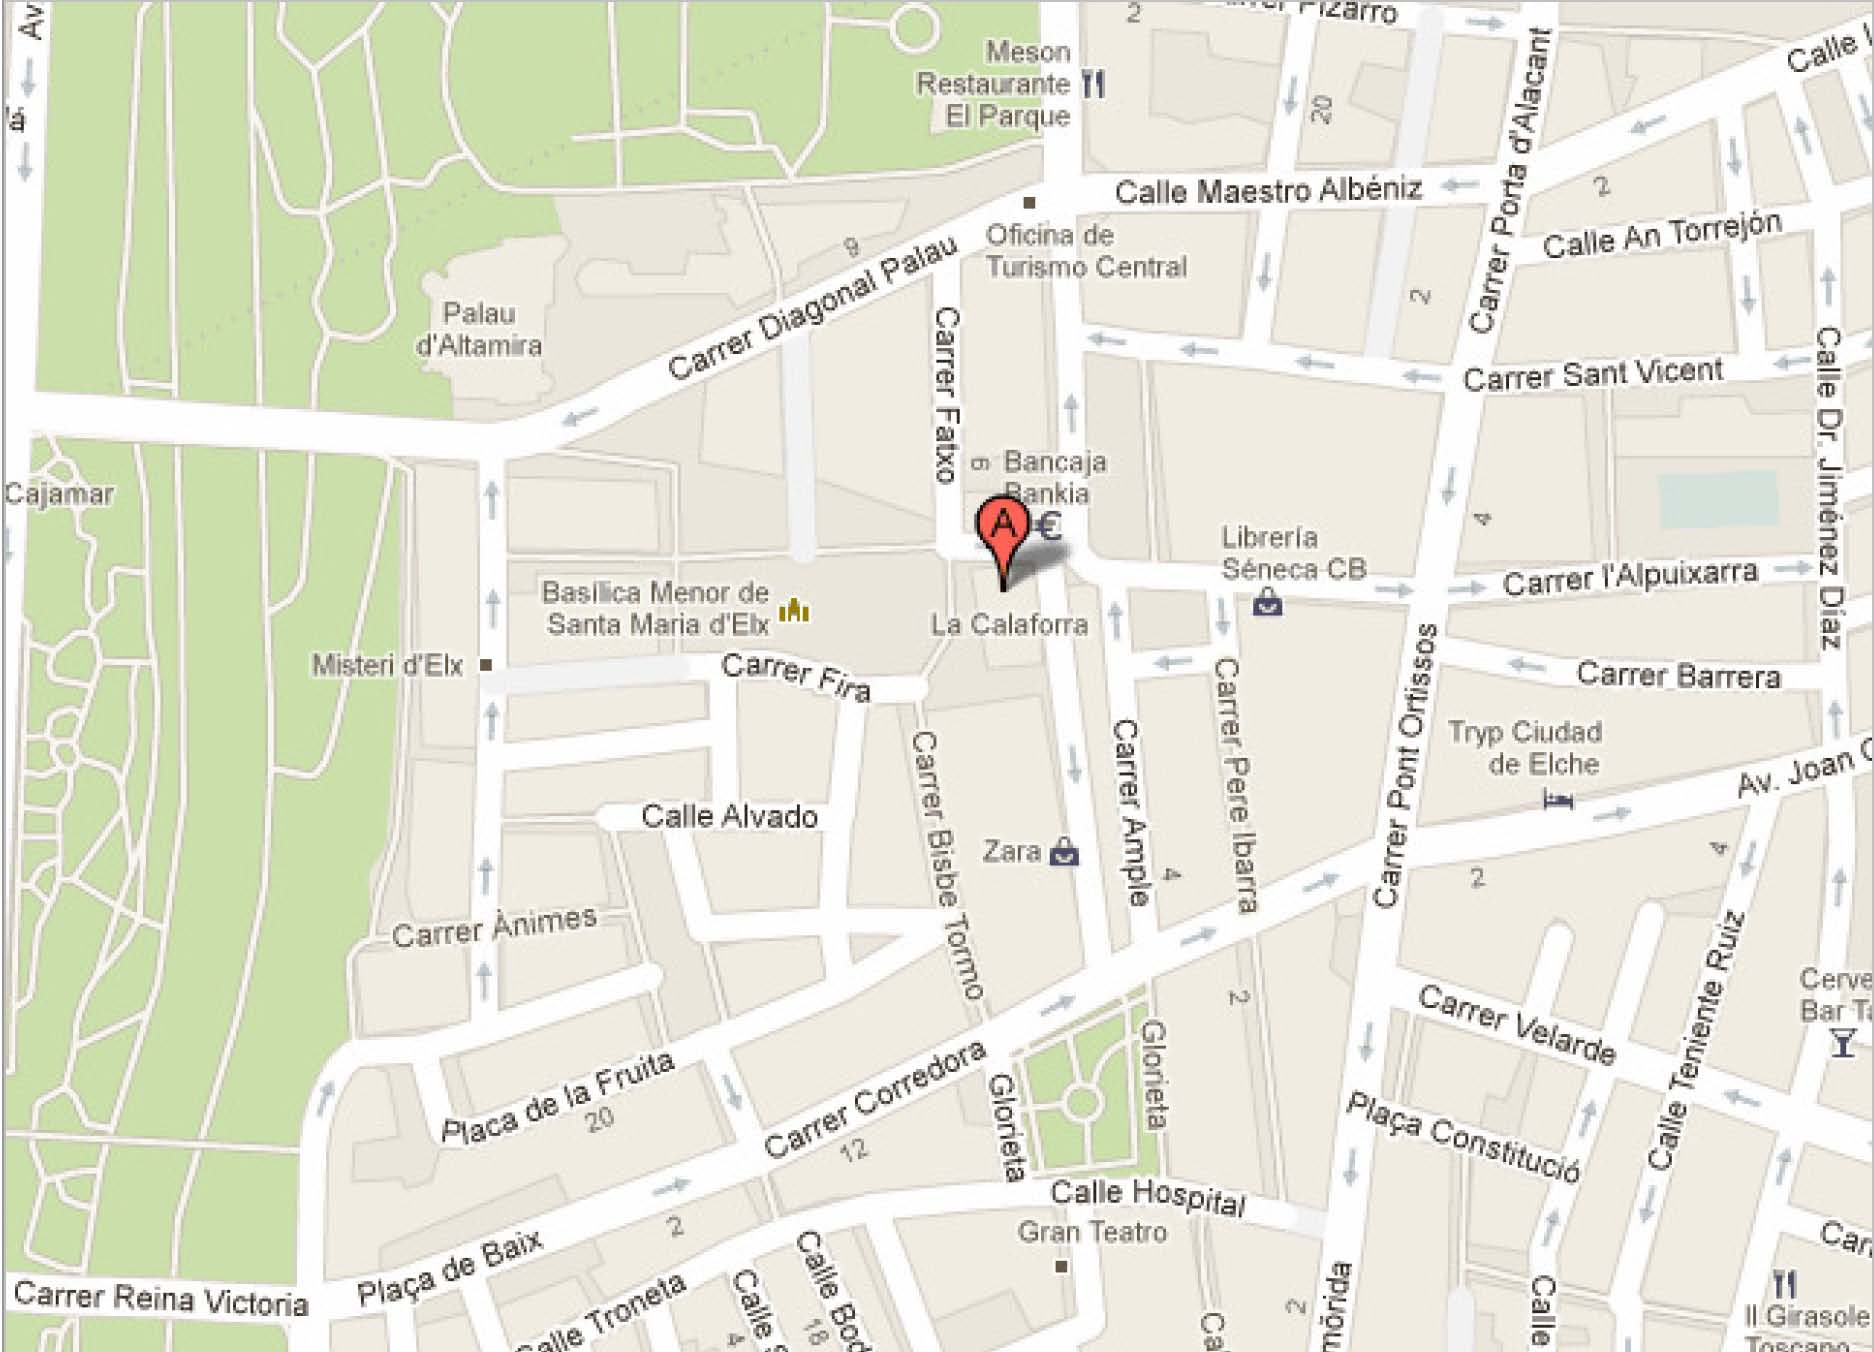 torre la calahorra, elche - Google Maps